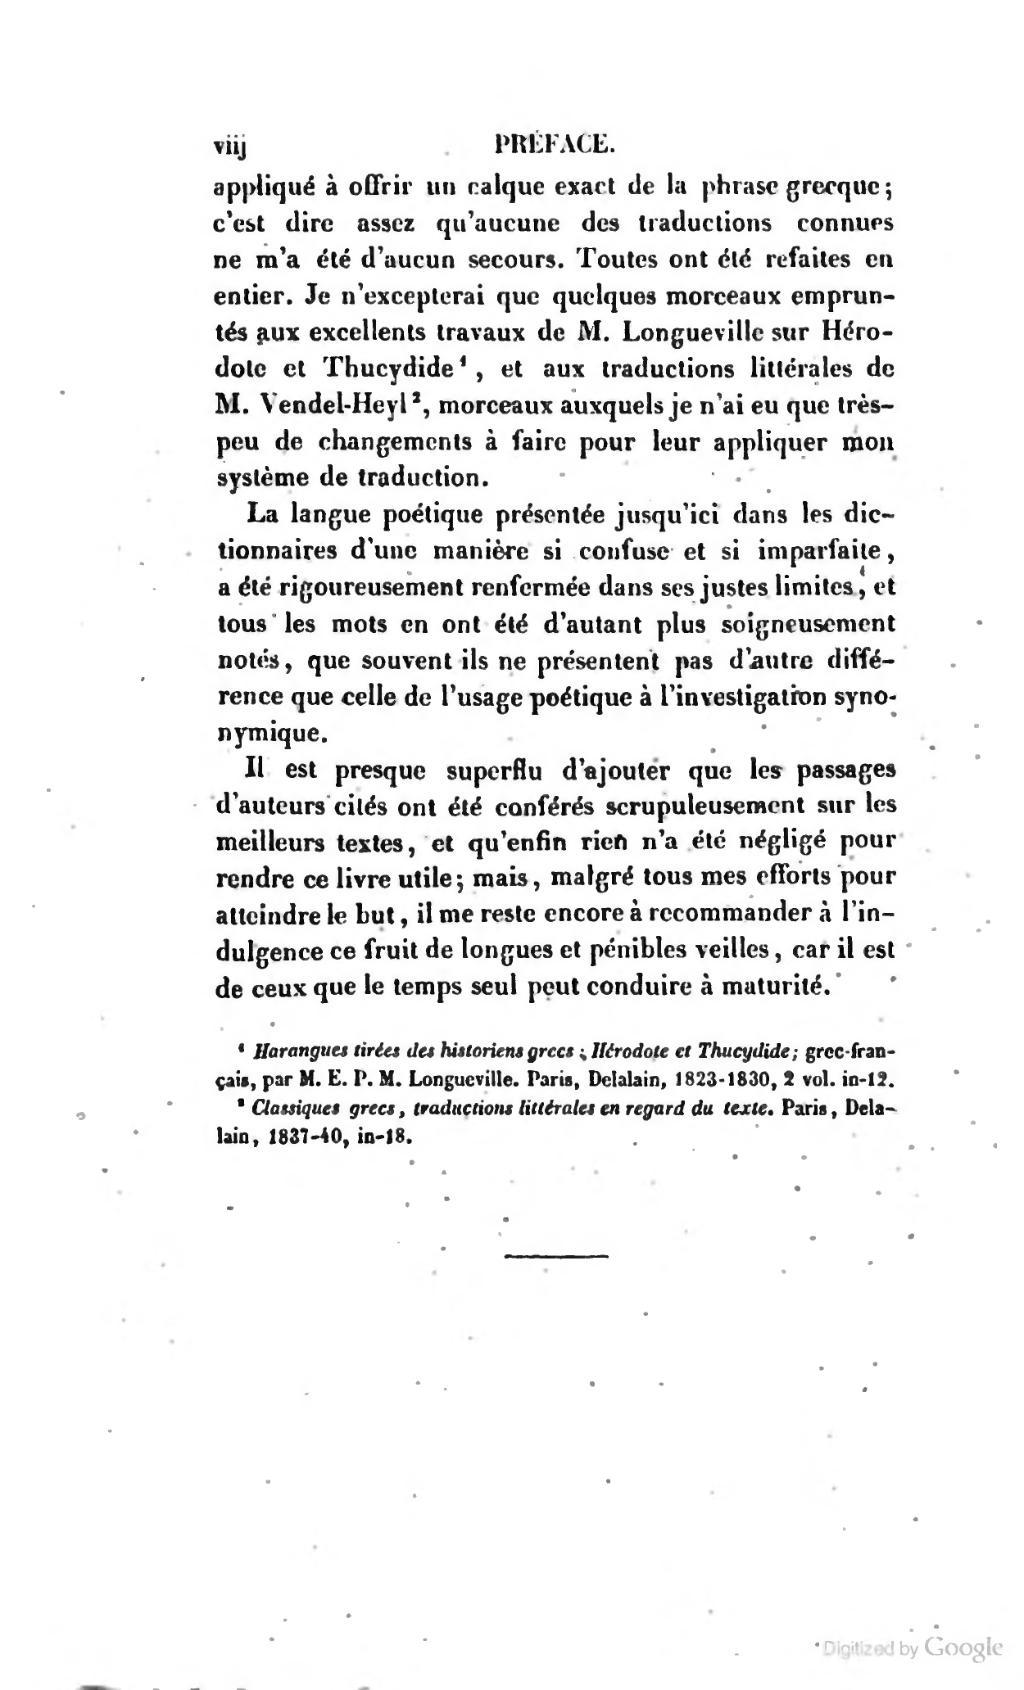 Page Pillon Synonymes Grecs Djvu 20 Wikisource